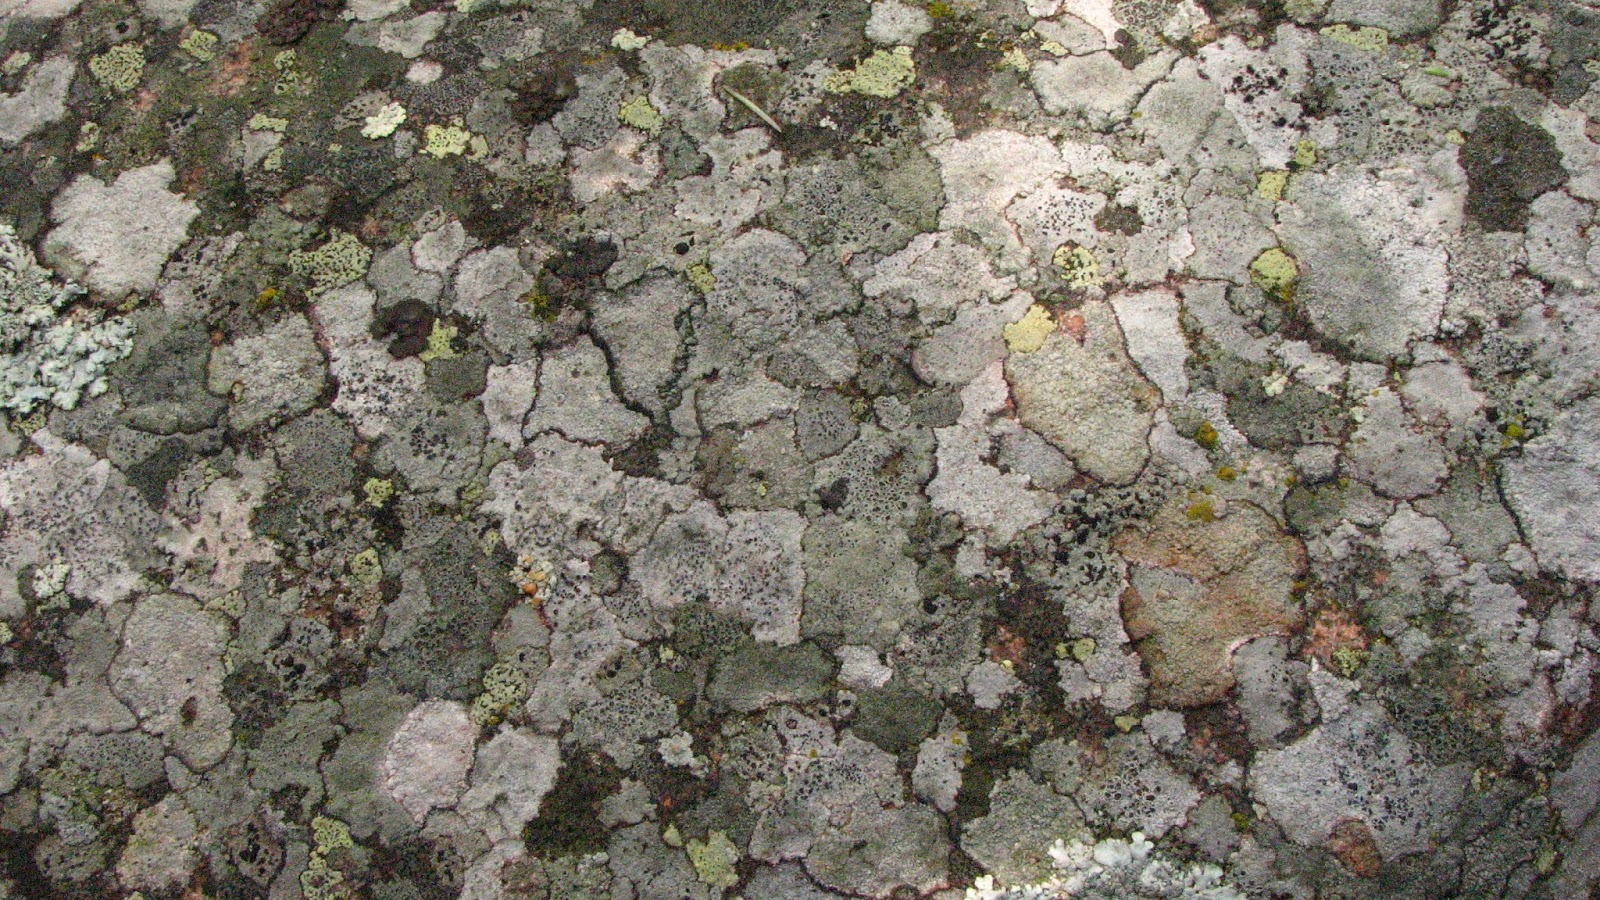 Hosting Lichens wallpaper